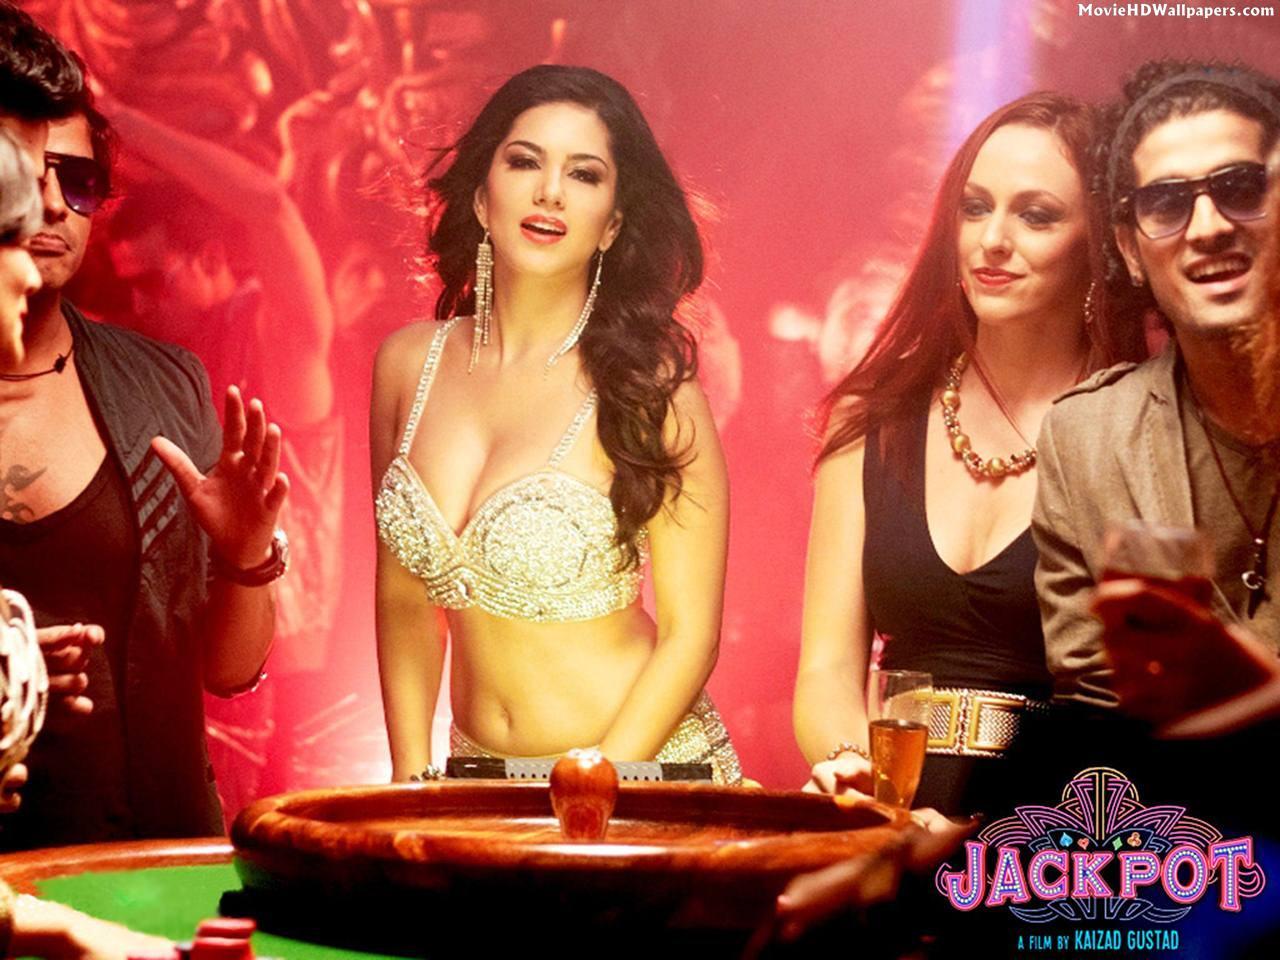 Jackpot Hindi Movie   Movie HD Wallpapers 1280x960